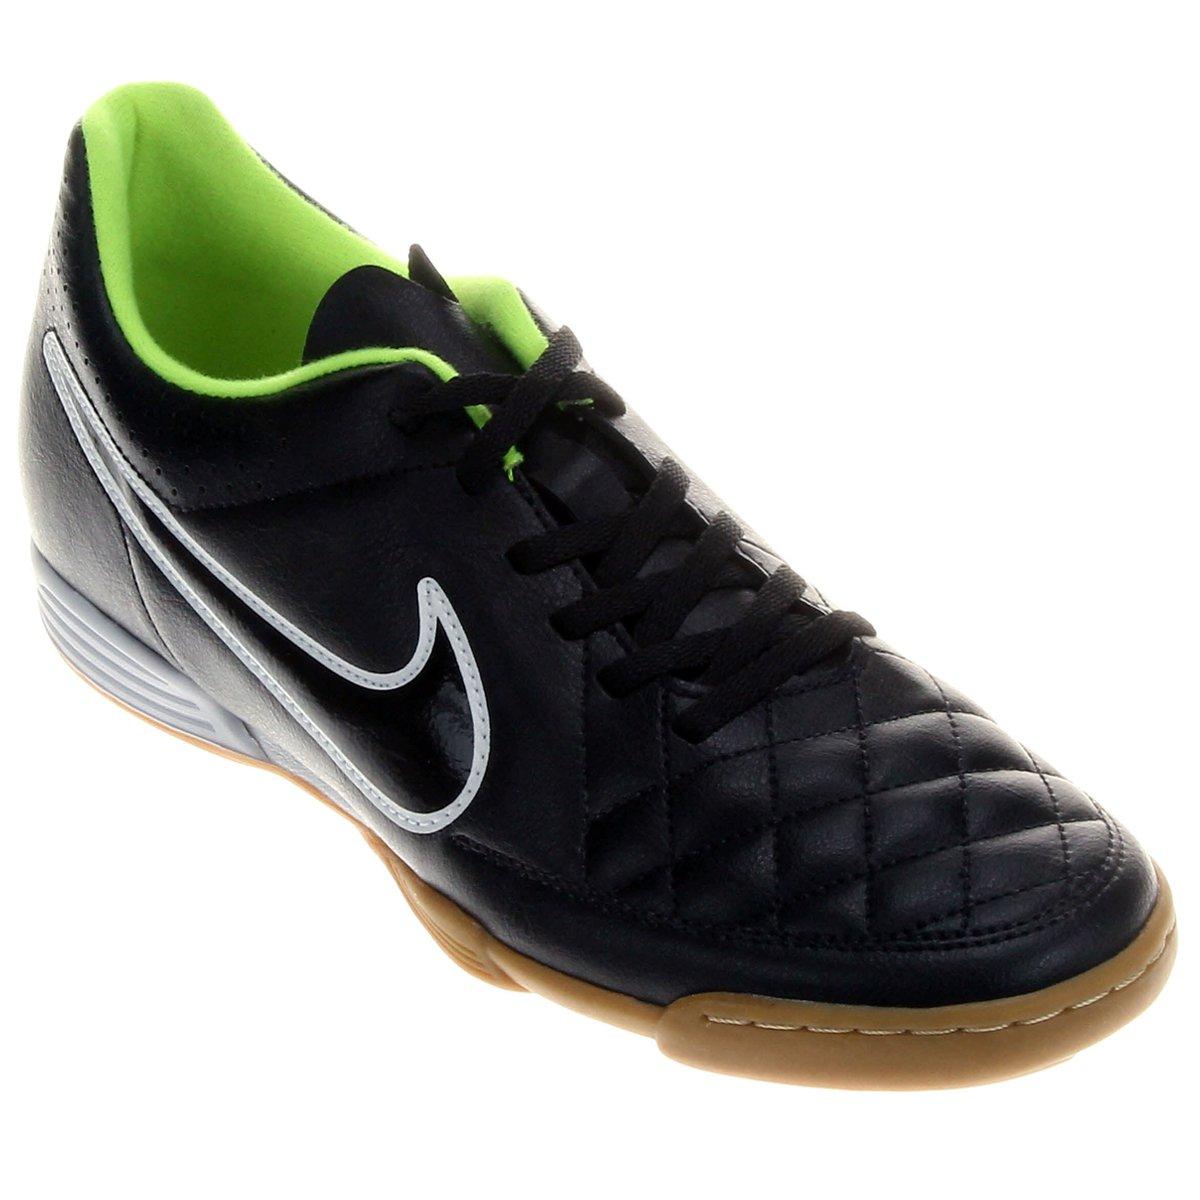 ac9e37cad8 Chuteira Nike Tiempo Rio 2 IC Futsal - Compre Agora